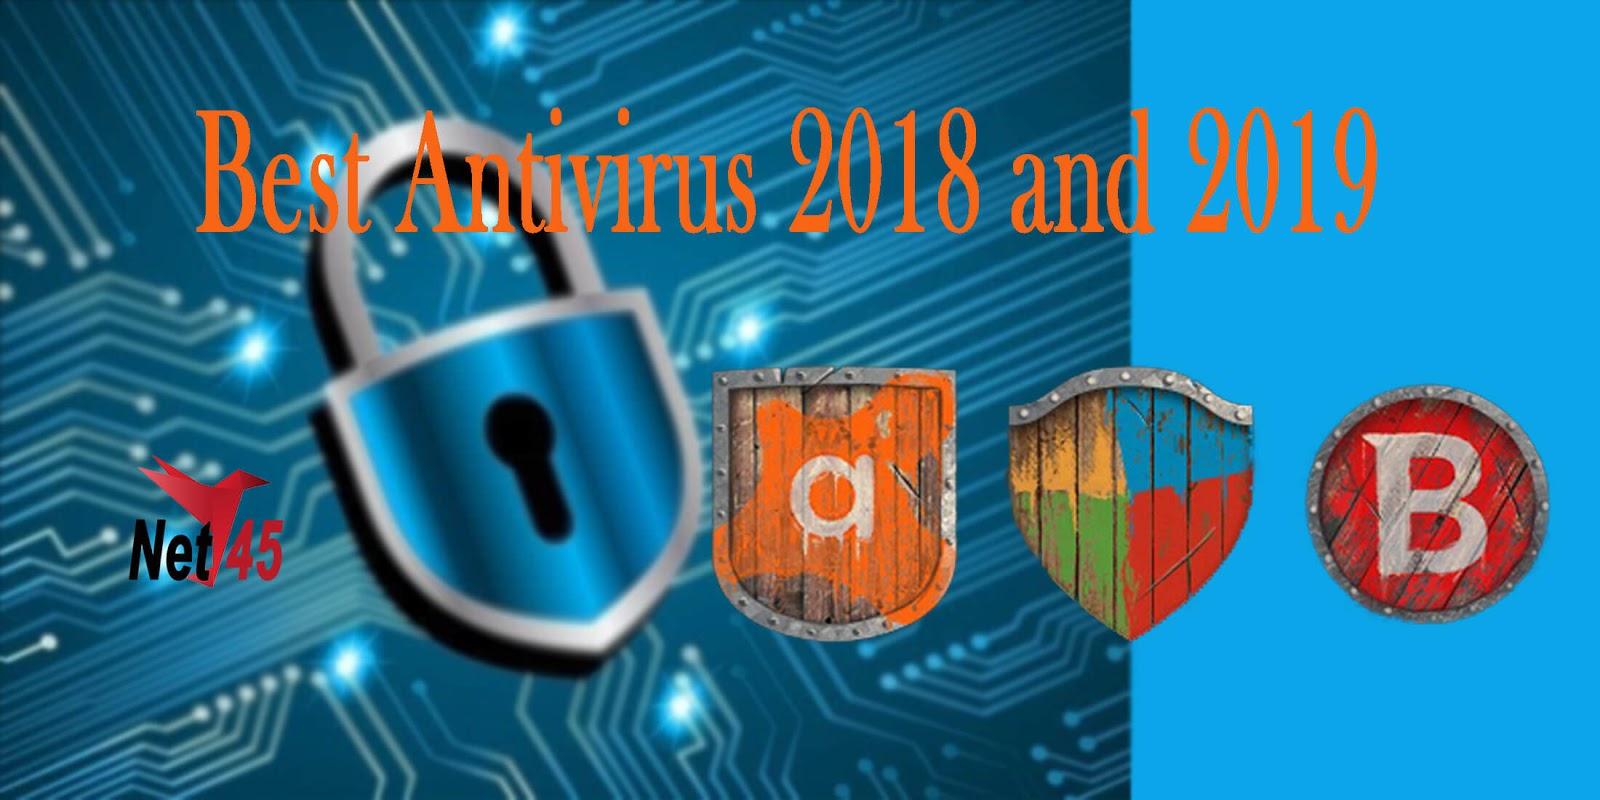 firewall and antivirus, best enterprise antivirus, symantec antivirus software, top antivirus and malware protection, best business antivirus